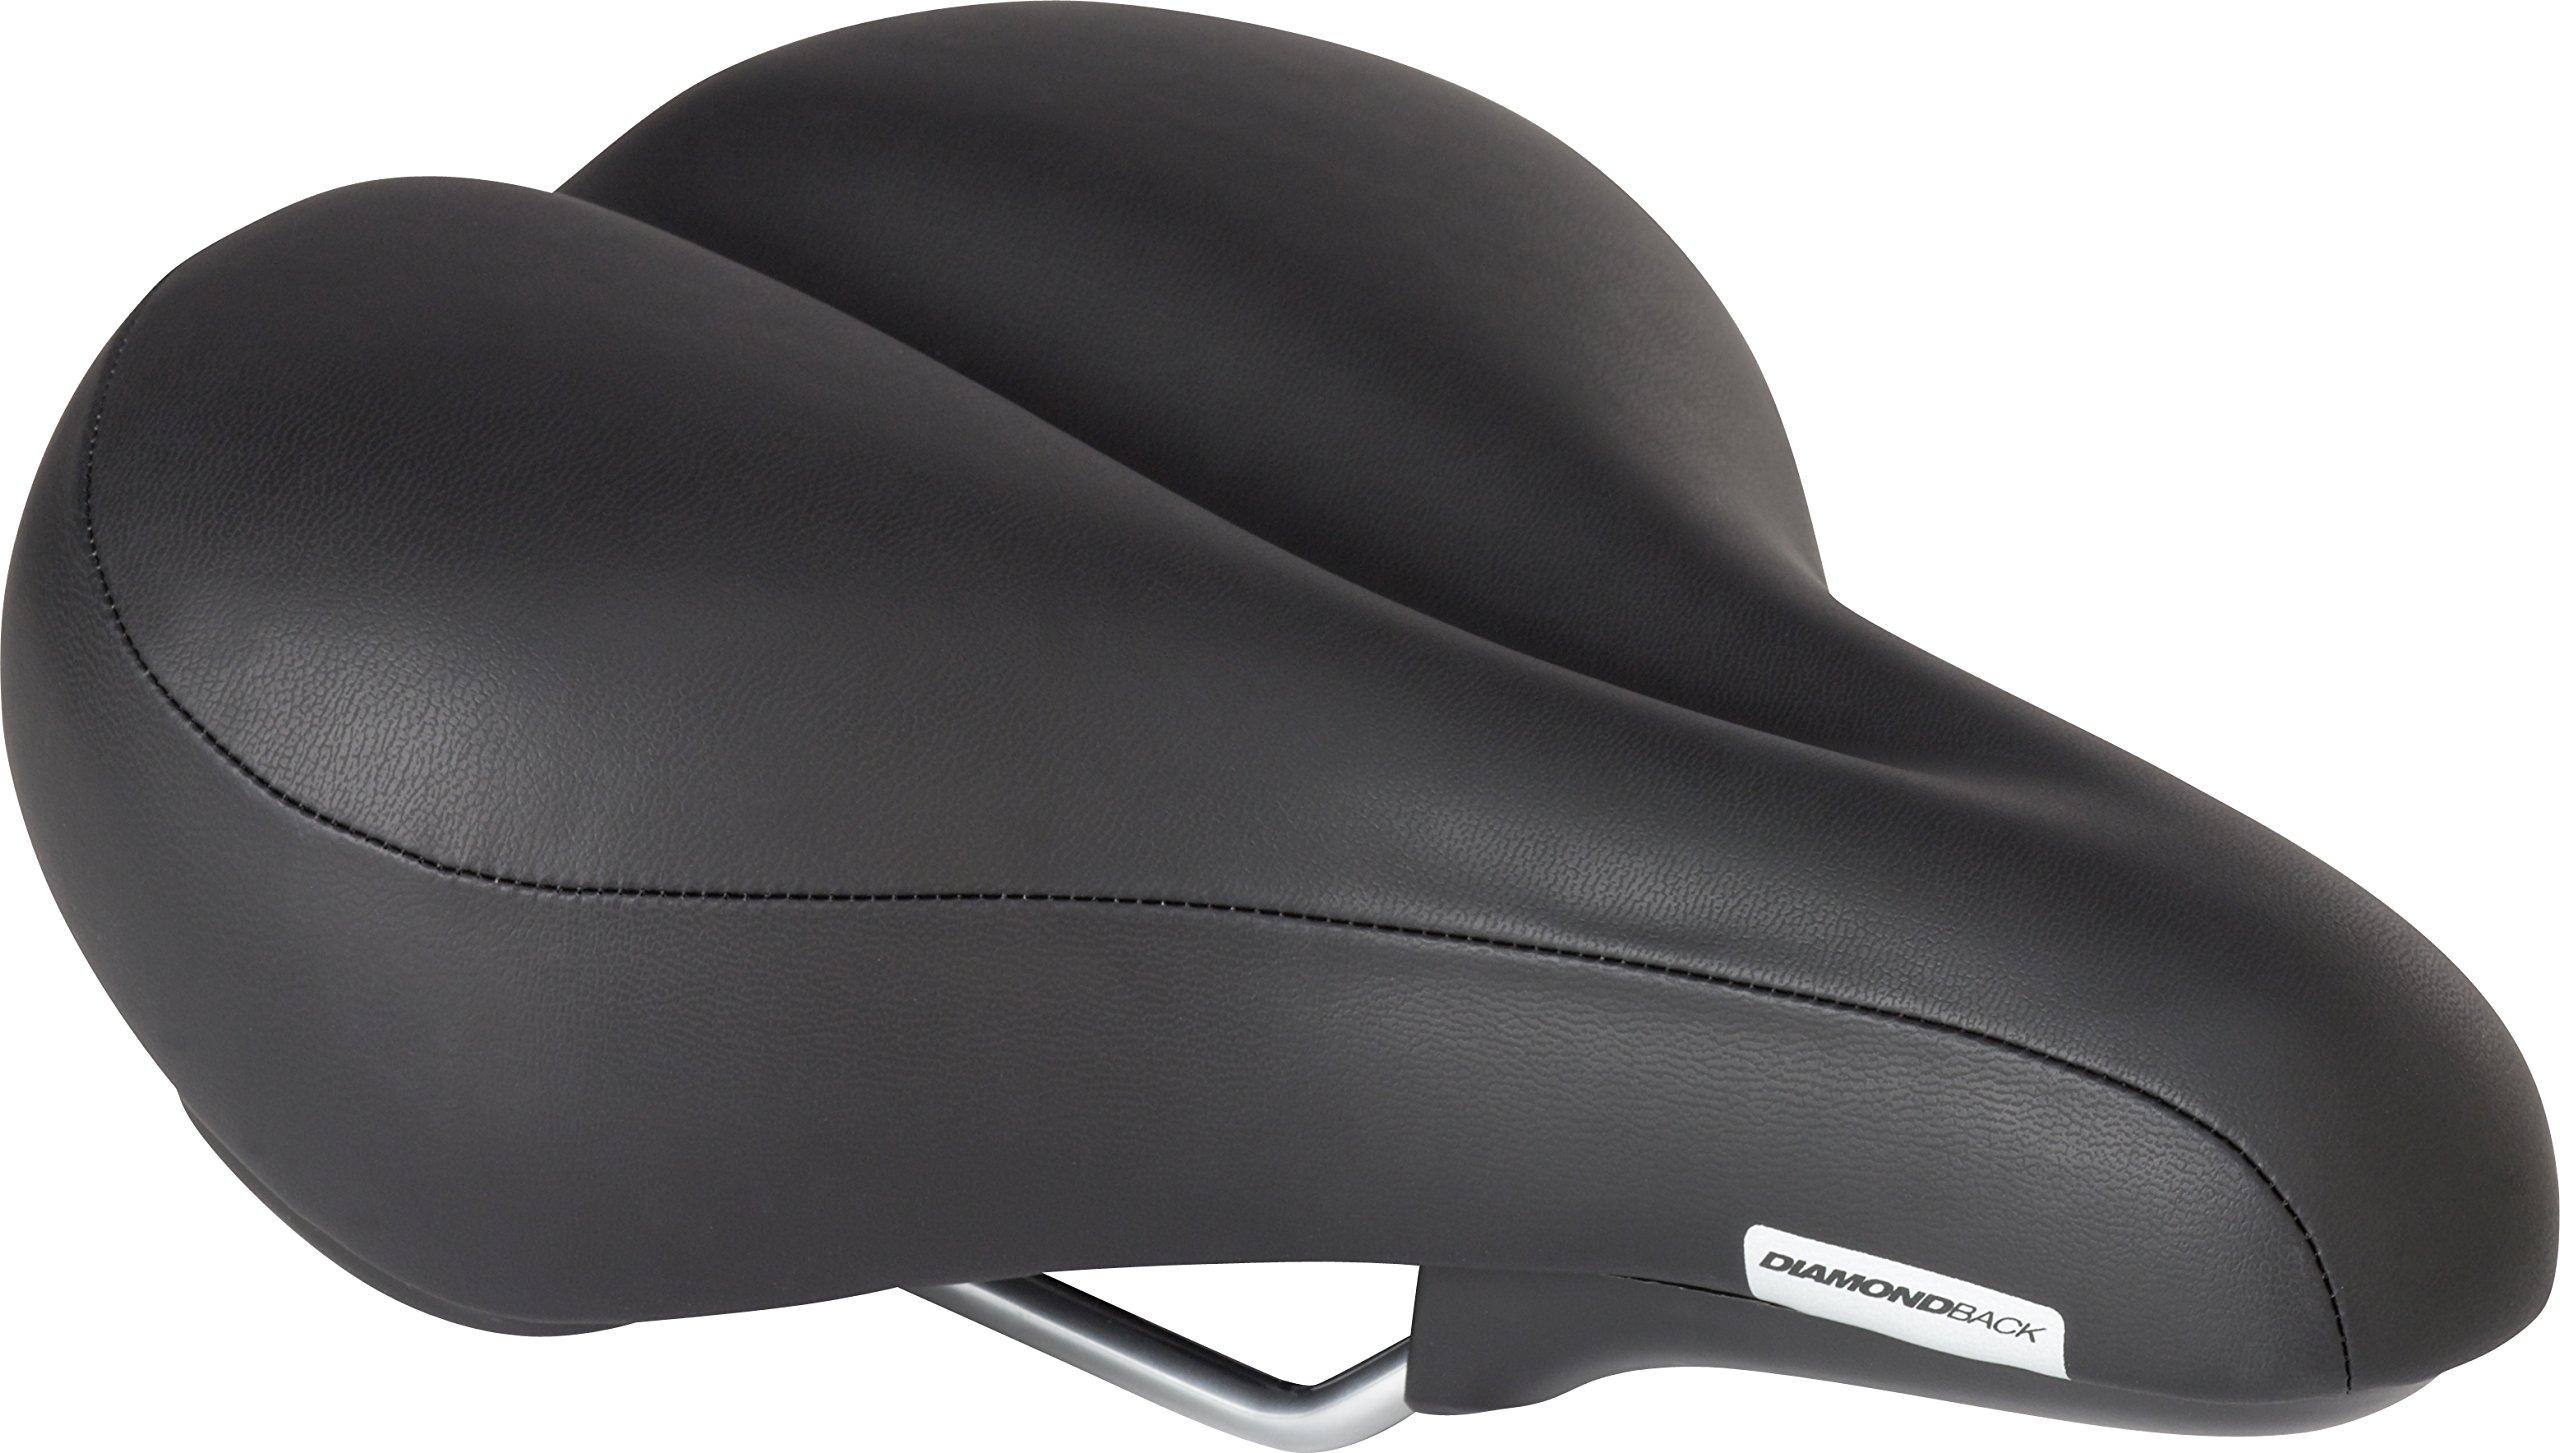 Diamondback Men's Pillow Top Bicycle Saddle, Black by Diamondback